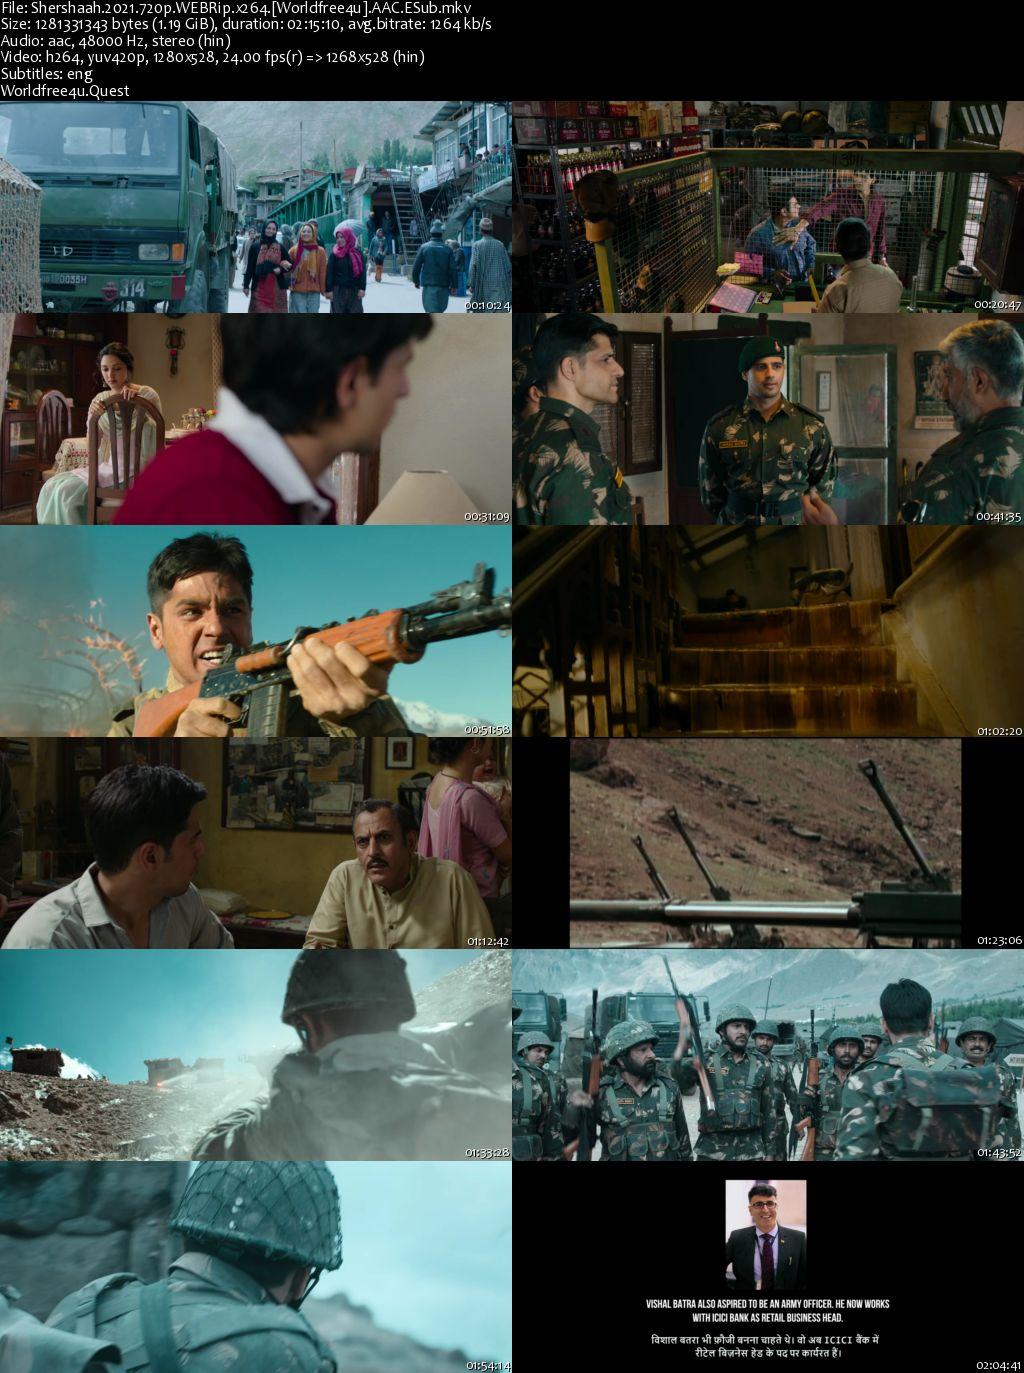 Shershaah 2021 Hindi Movie Download || HDRip || 480p || 720p || 1080p